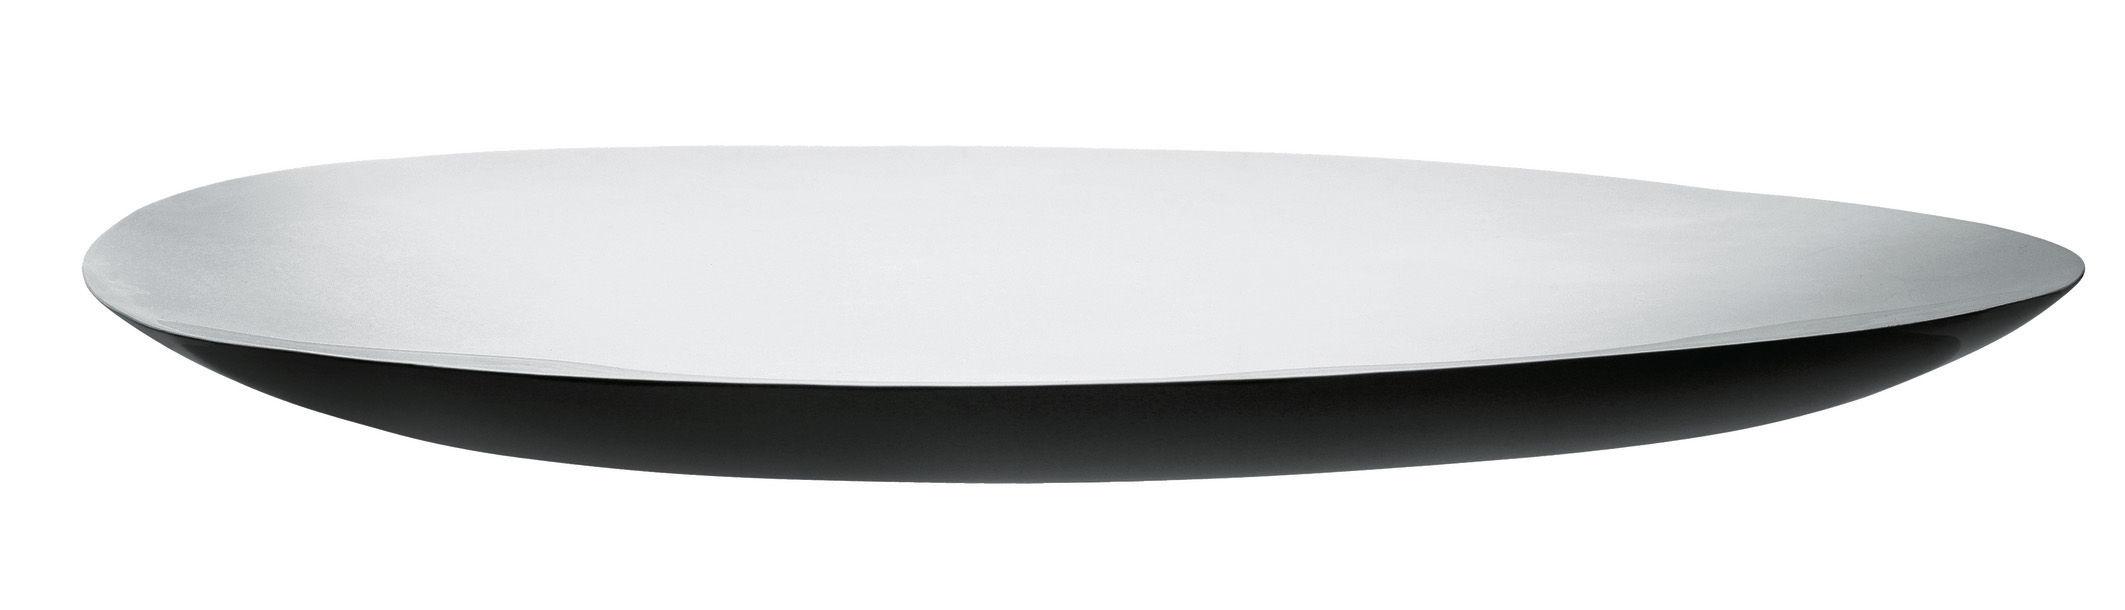 Arts de la table - Plateaux - Plateau Disco Volante / Ø 40 cm - Alessi - Acier - Acier inoxydable